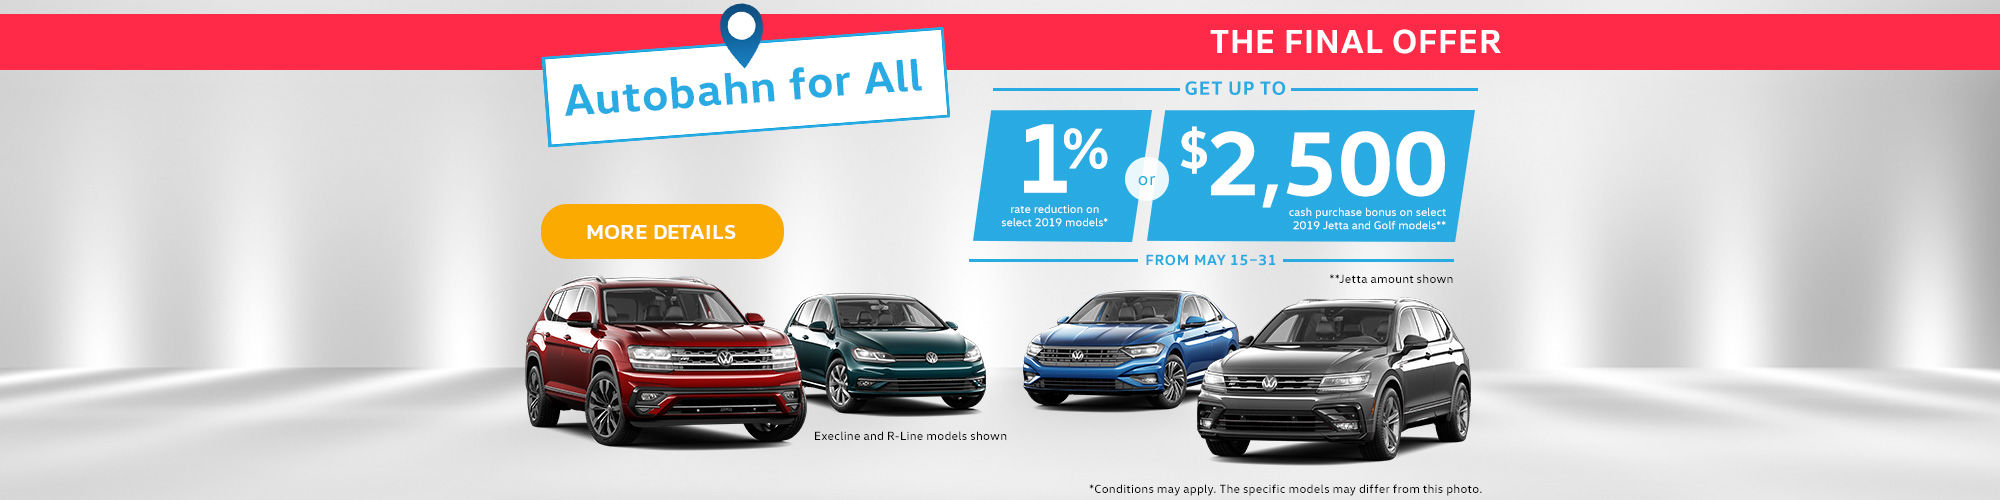 Volkswagen Final Offer